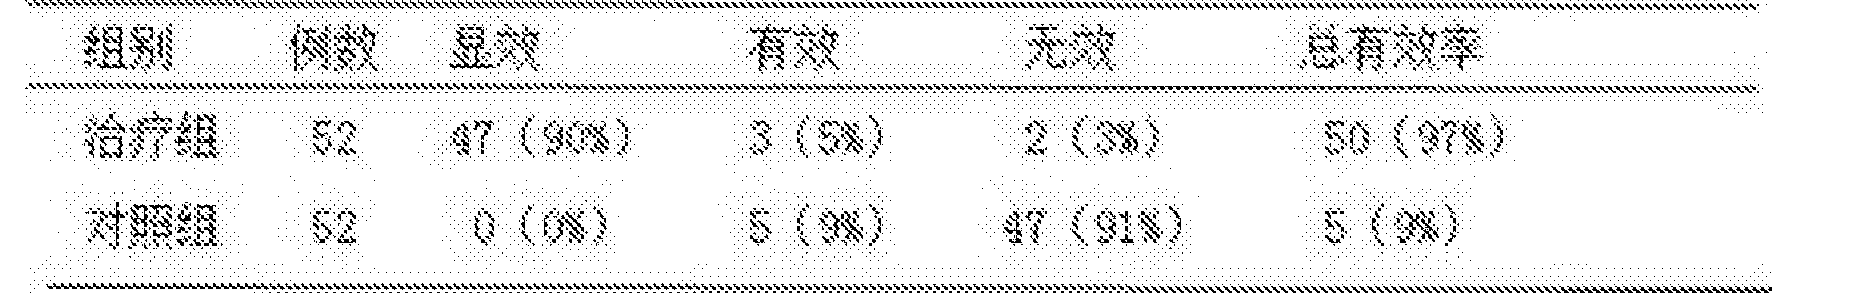 Figure CN107638448AD00131